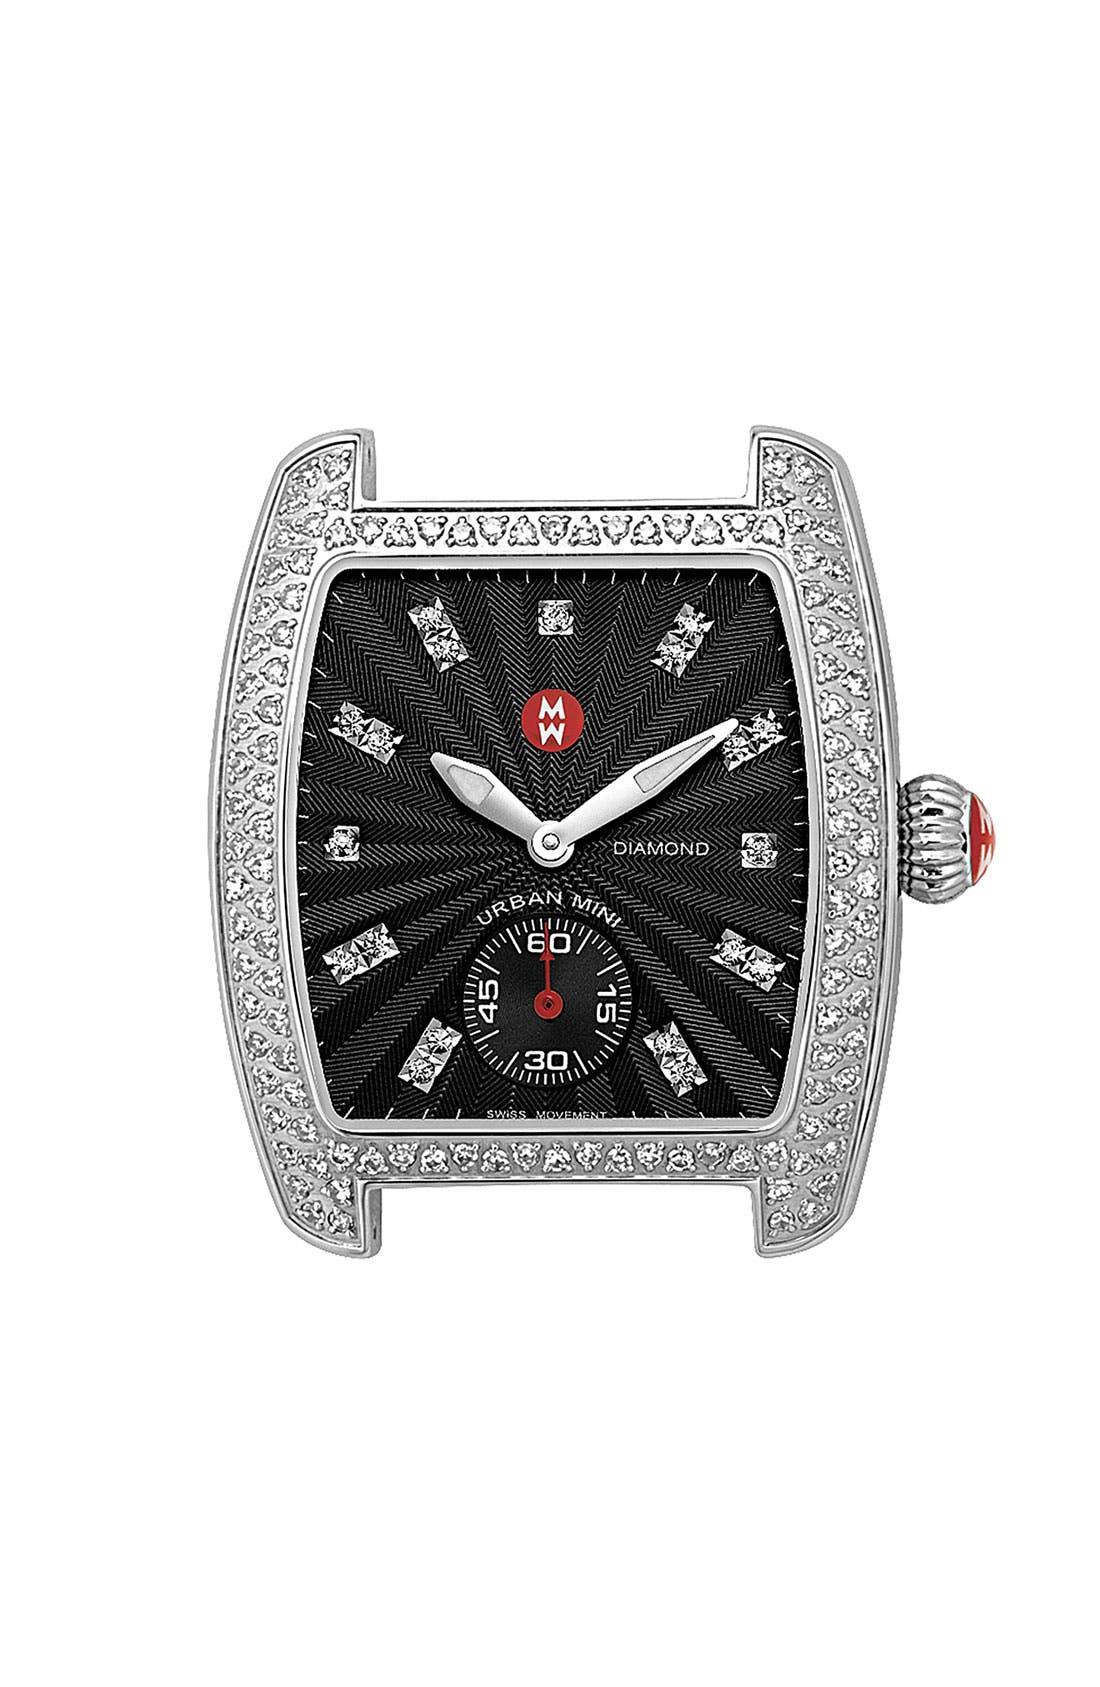 Alternate Image 1 Selected - MICHELE 'Urban Mini Diamond' Black Dial Watch Case